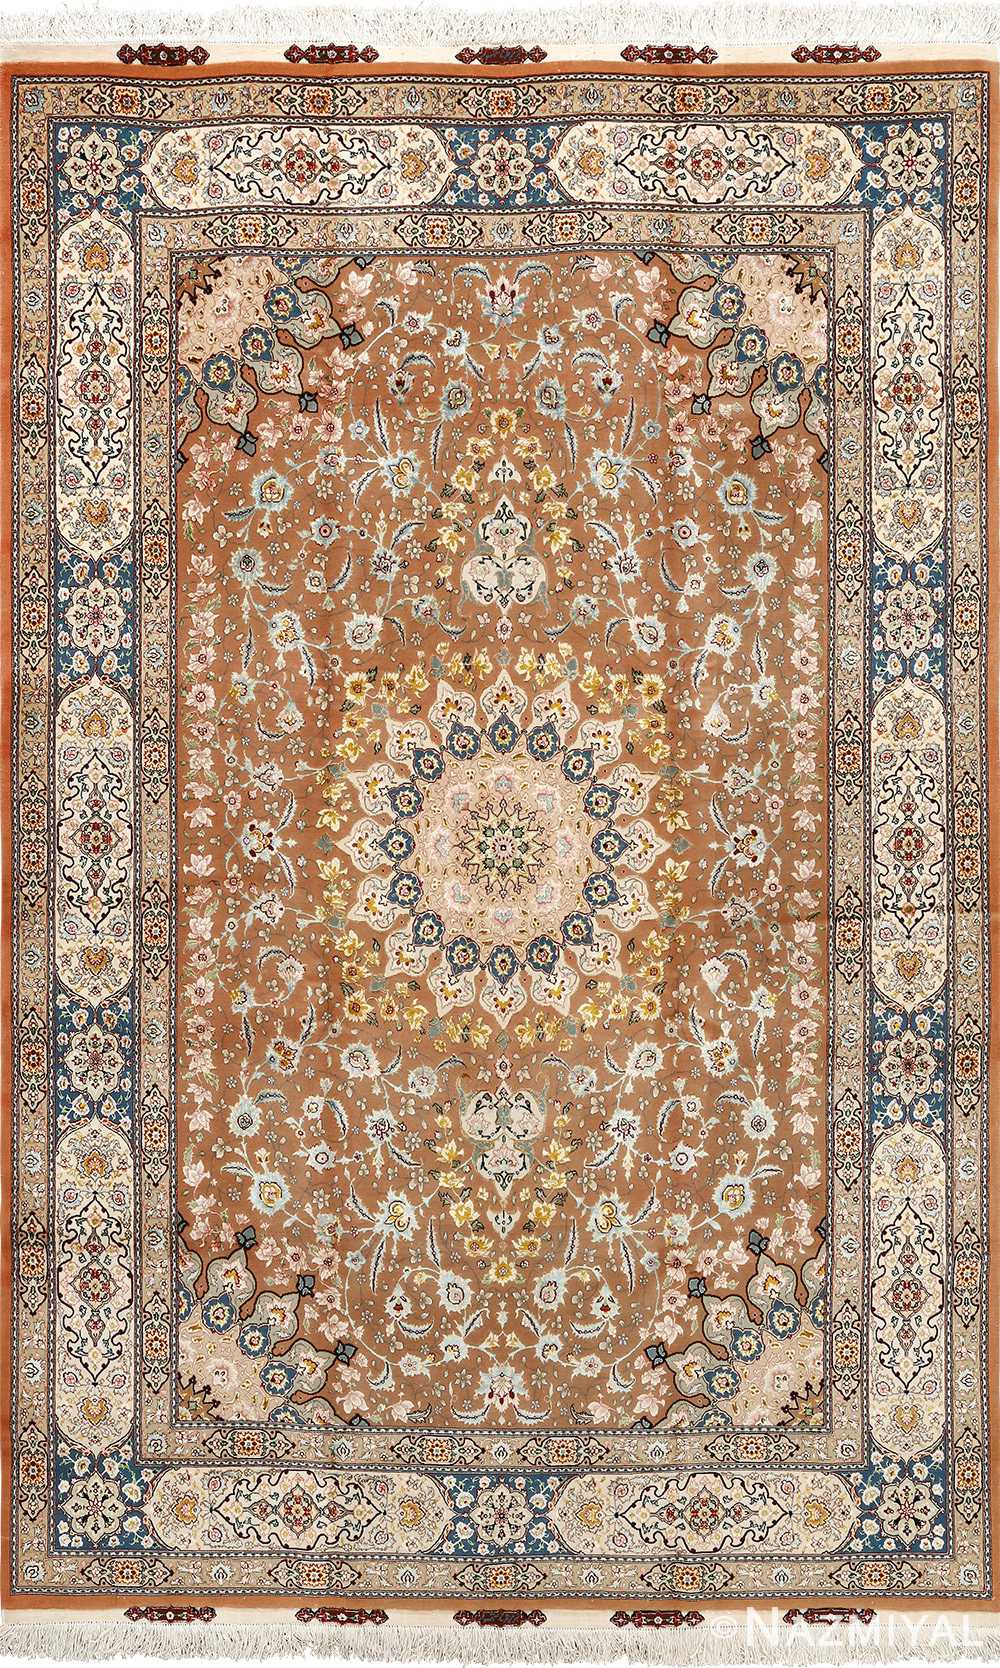 shahsavarpour design vintage tabriz persian rug 51158 Nazmiyal